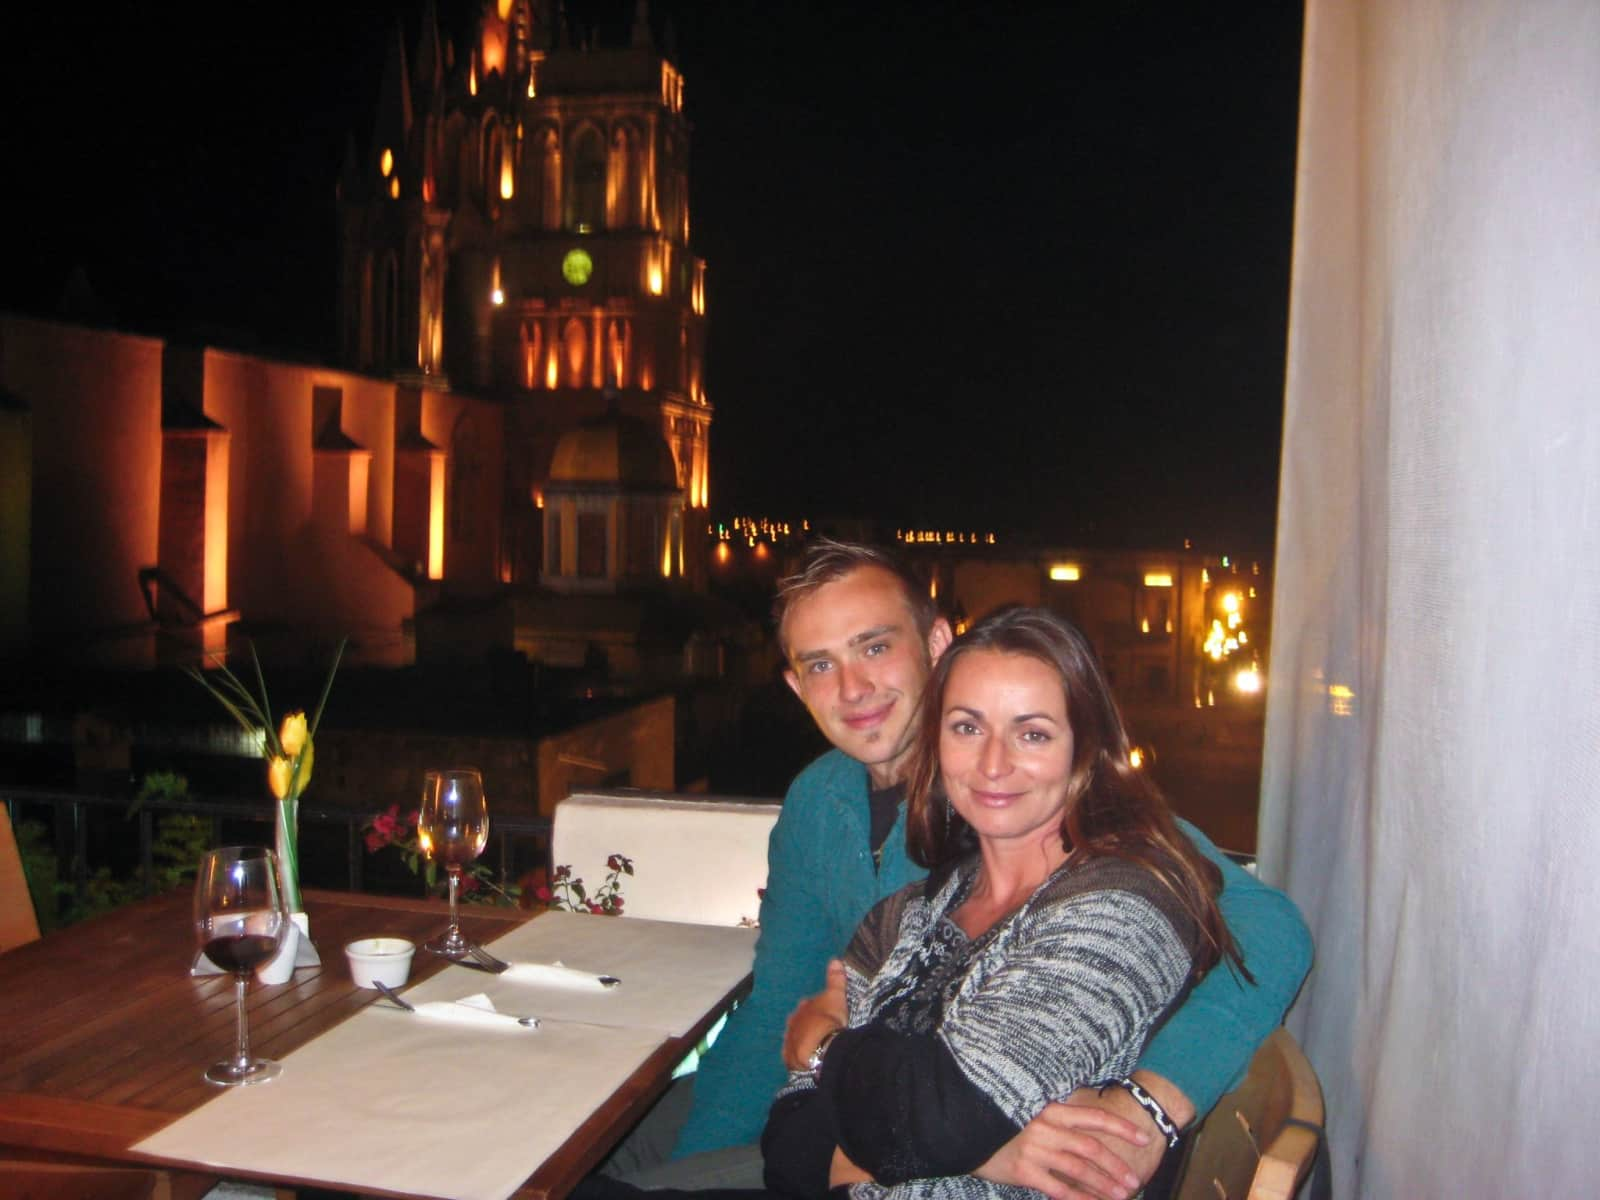 Natalia & Antoine from Orlando, Florida, United States